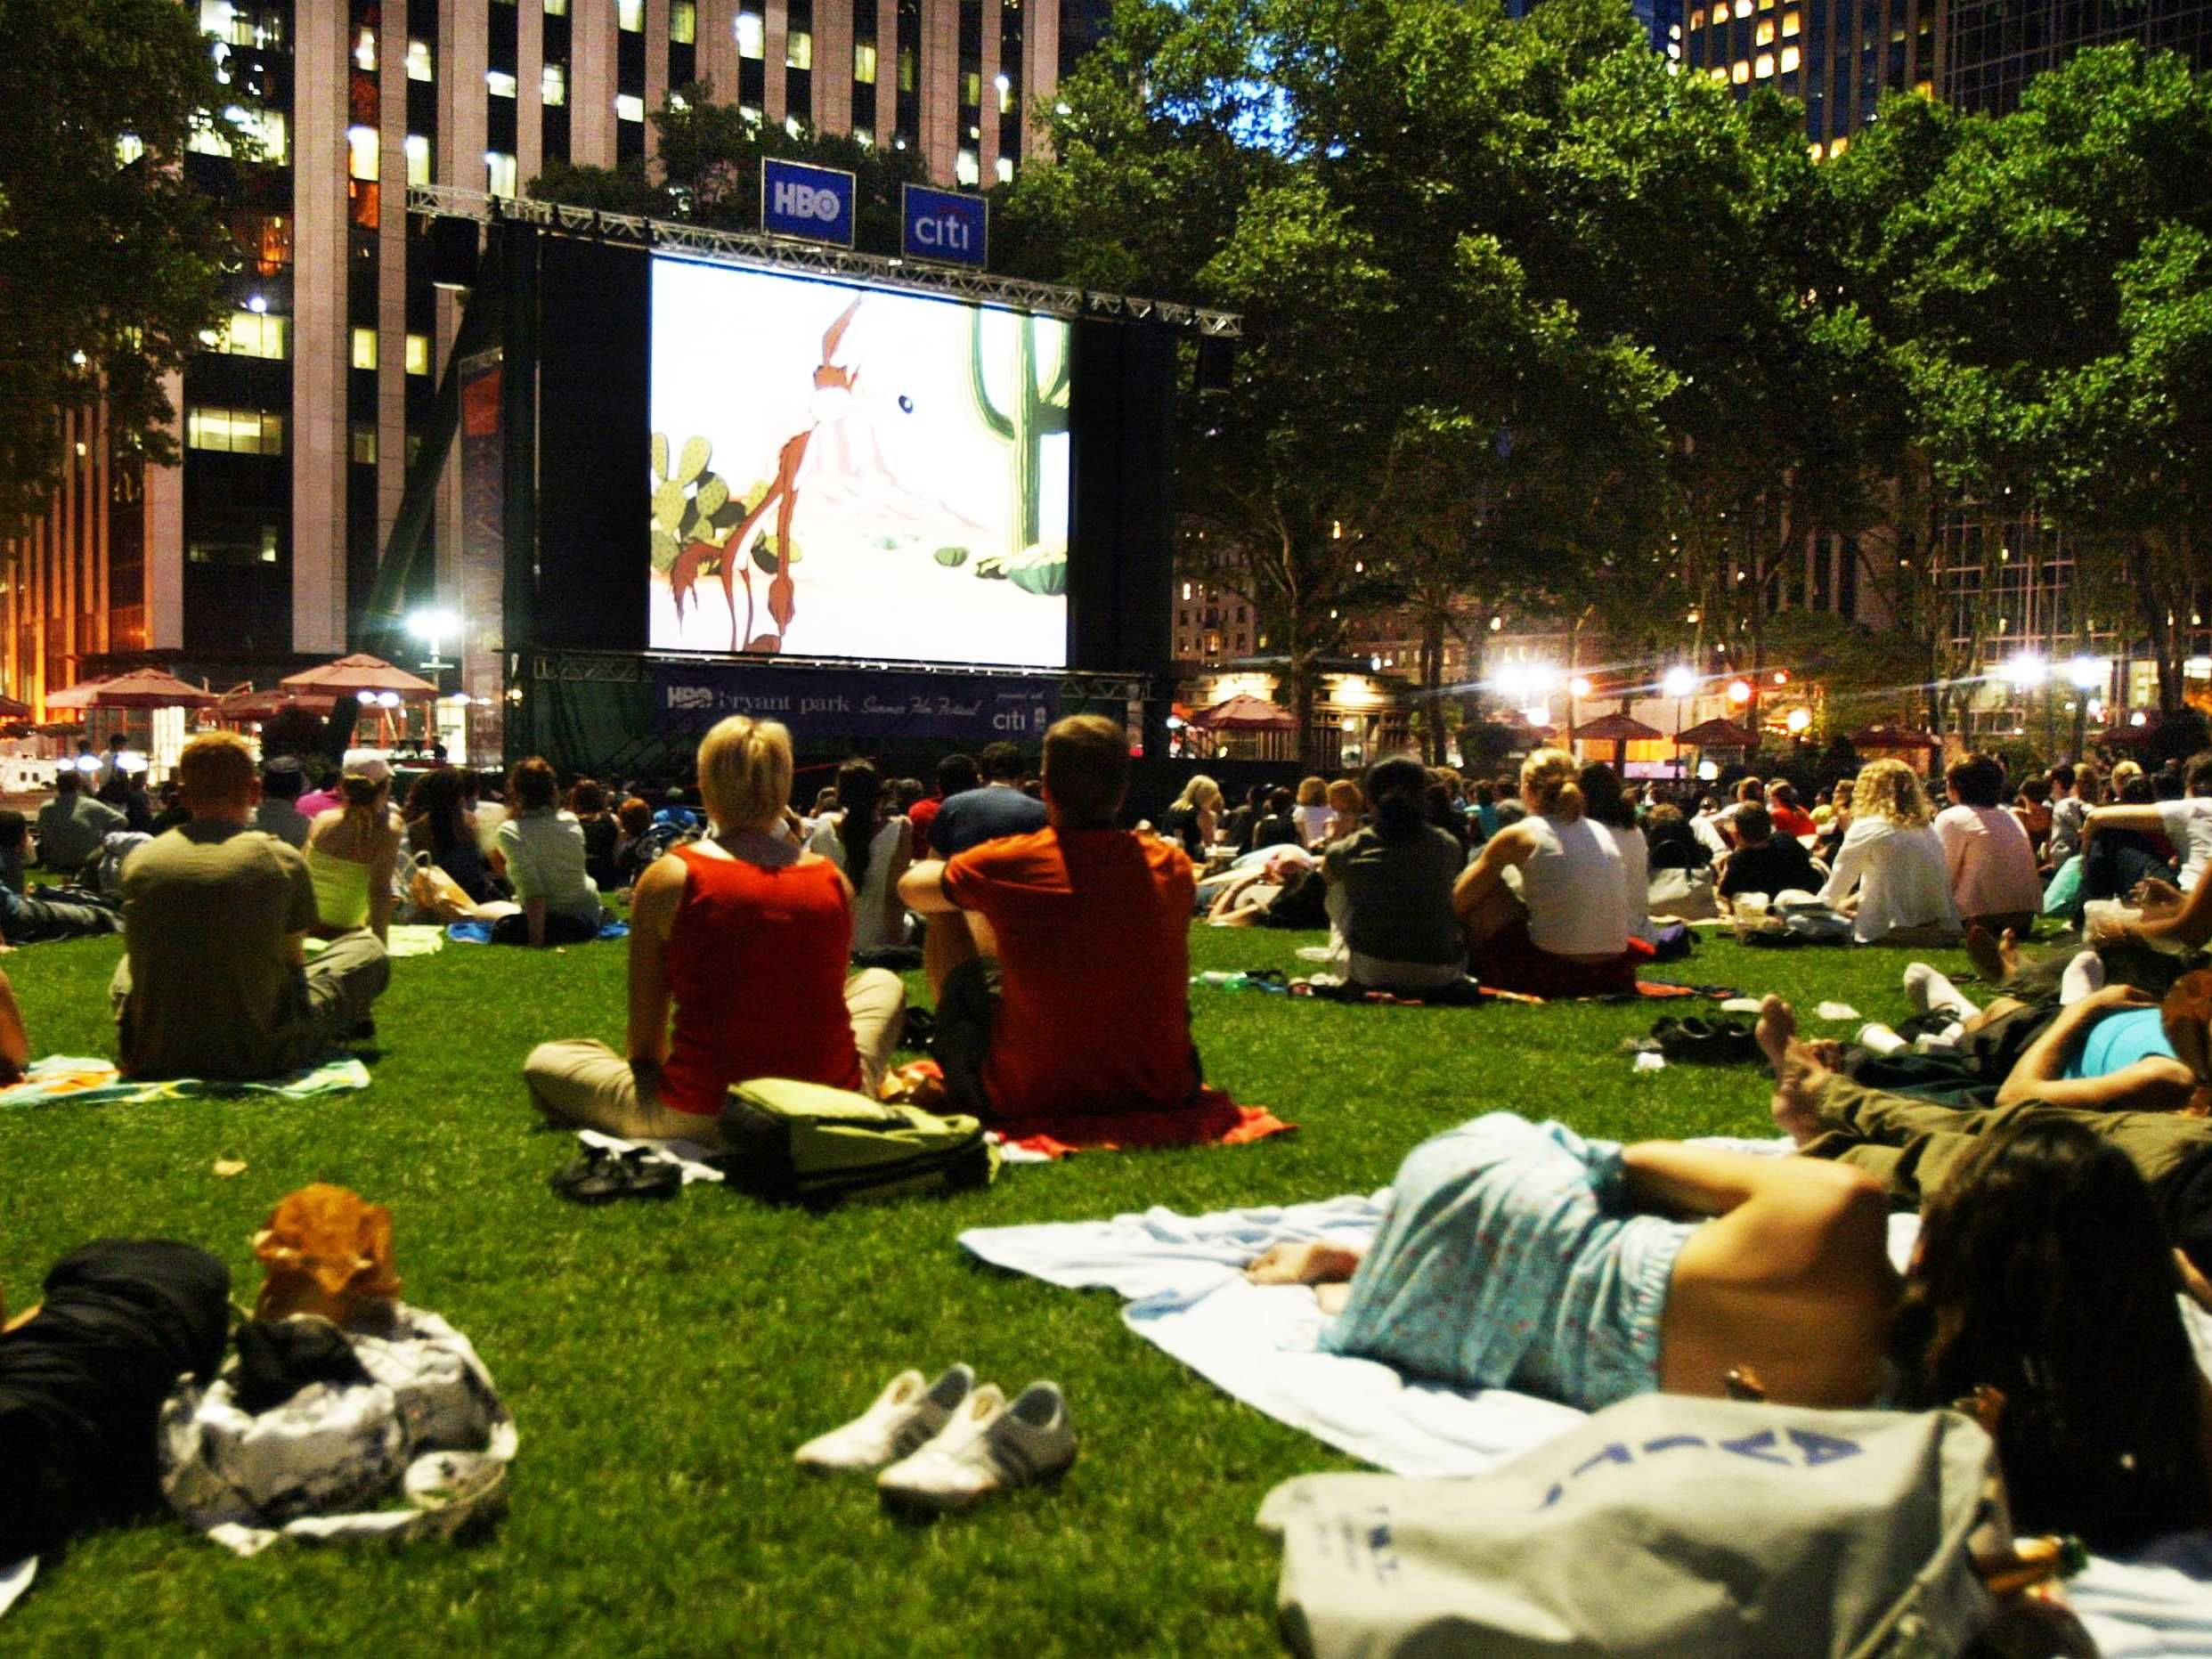 fort worth sundance movie outdoor - Google Search